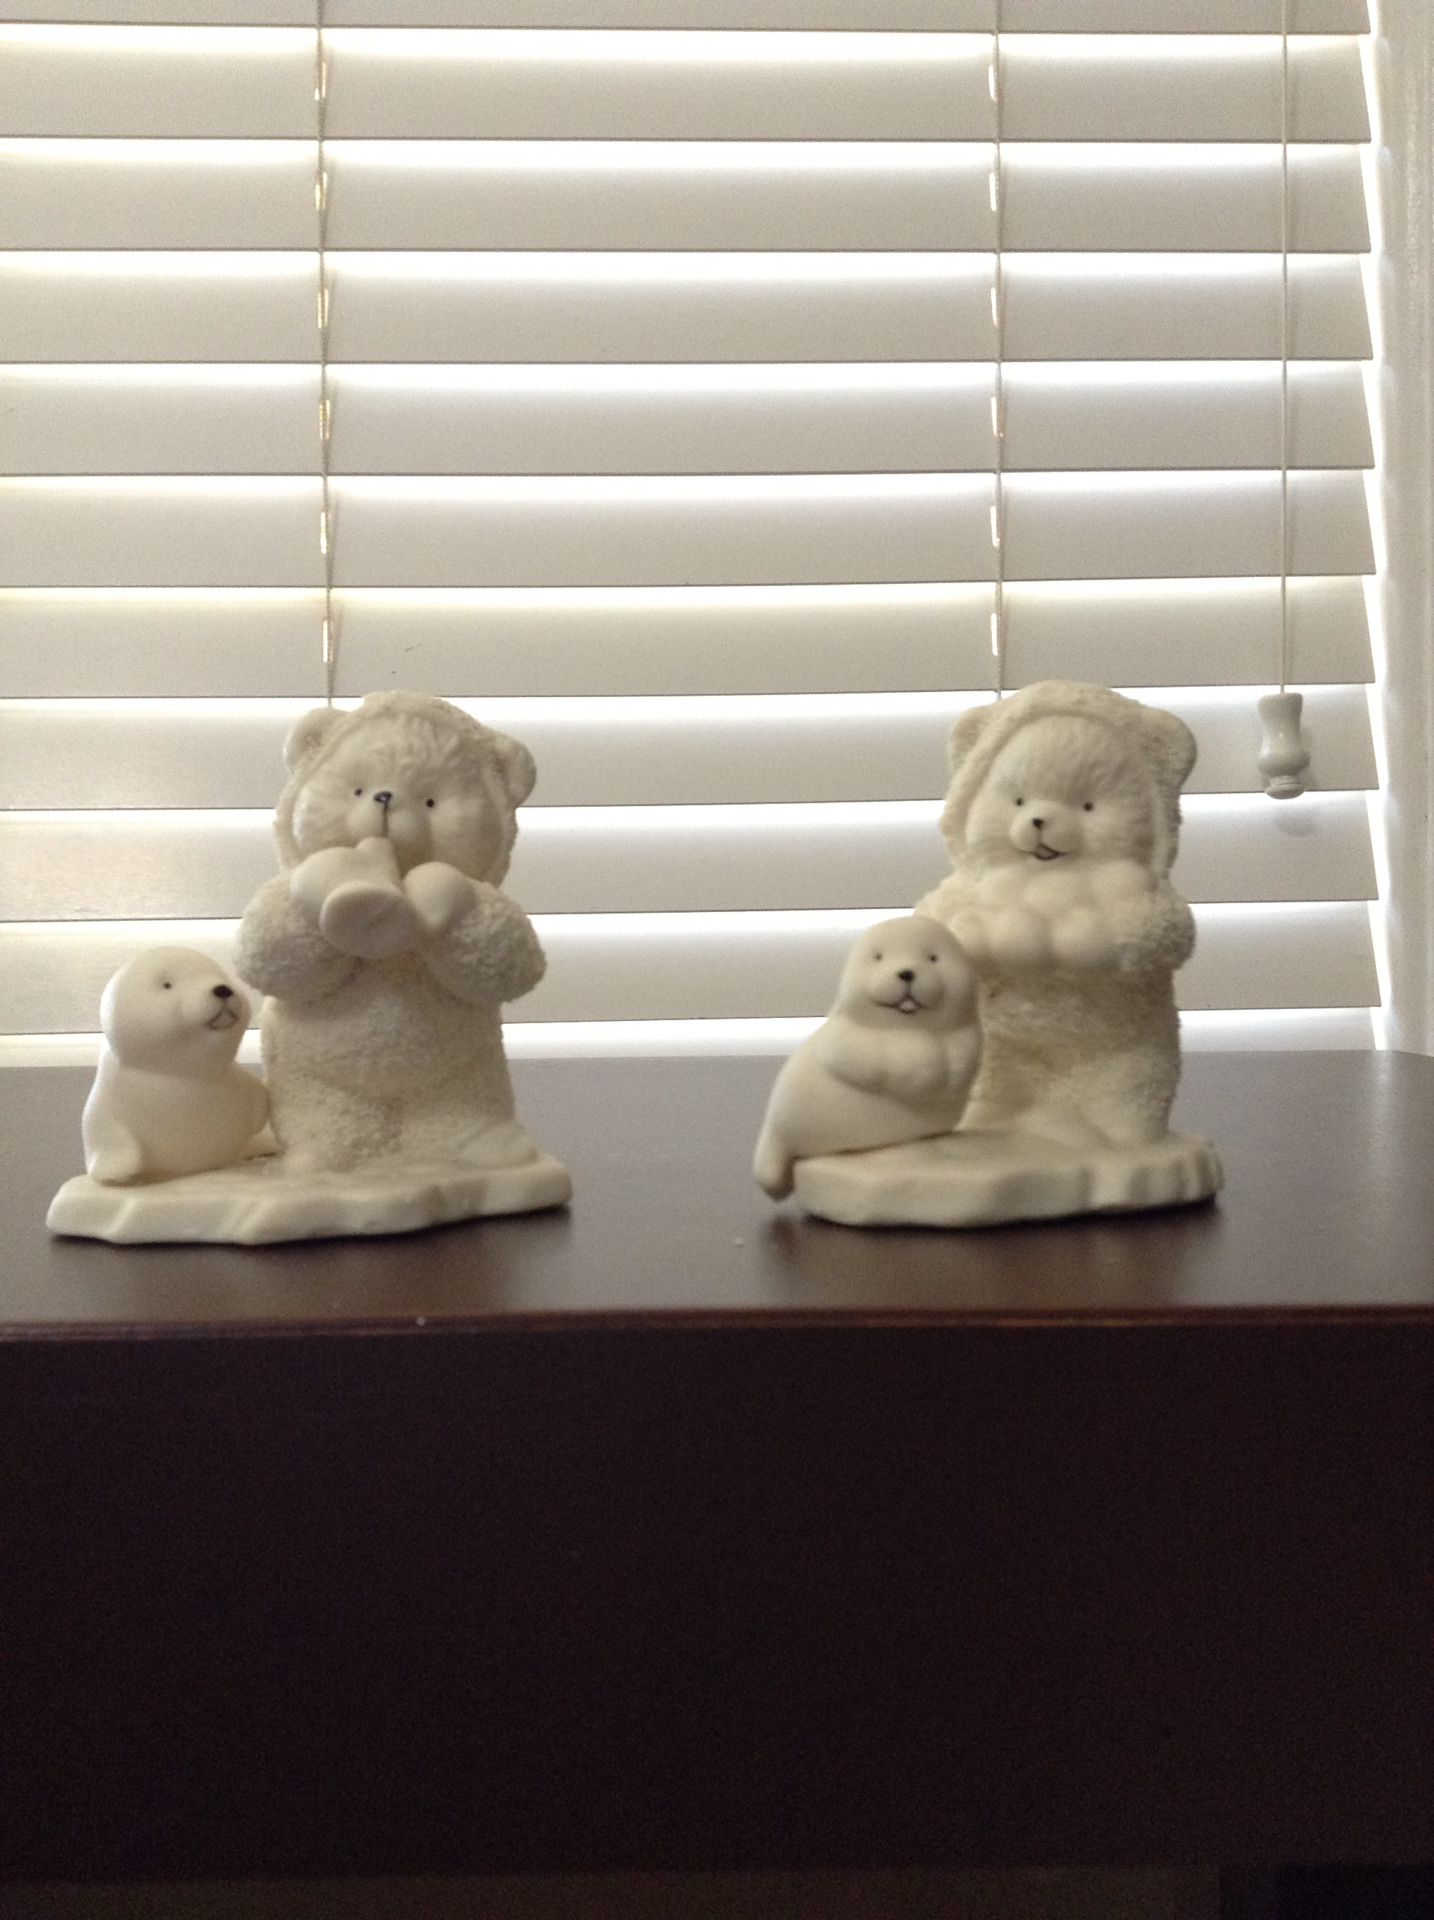 Porcelaine figures